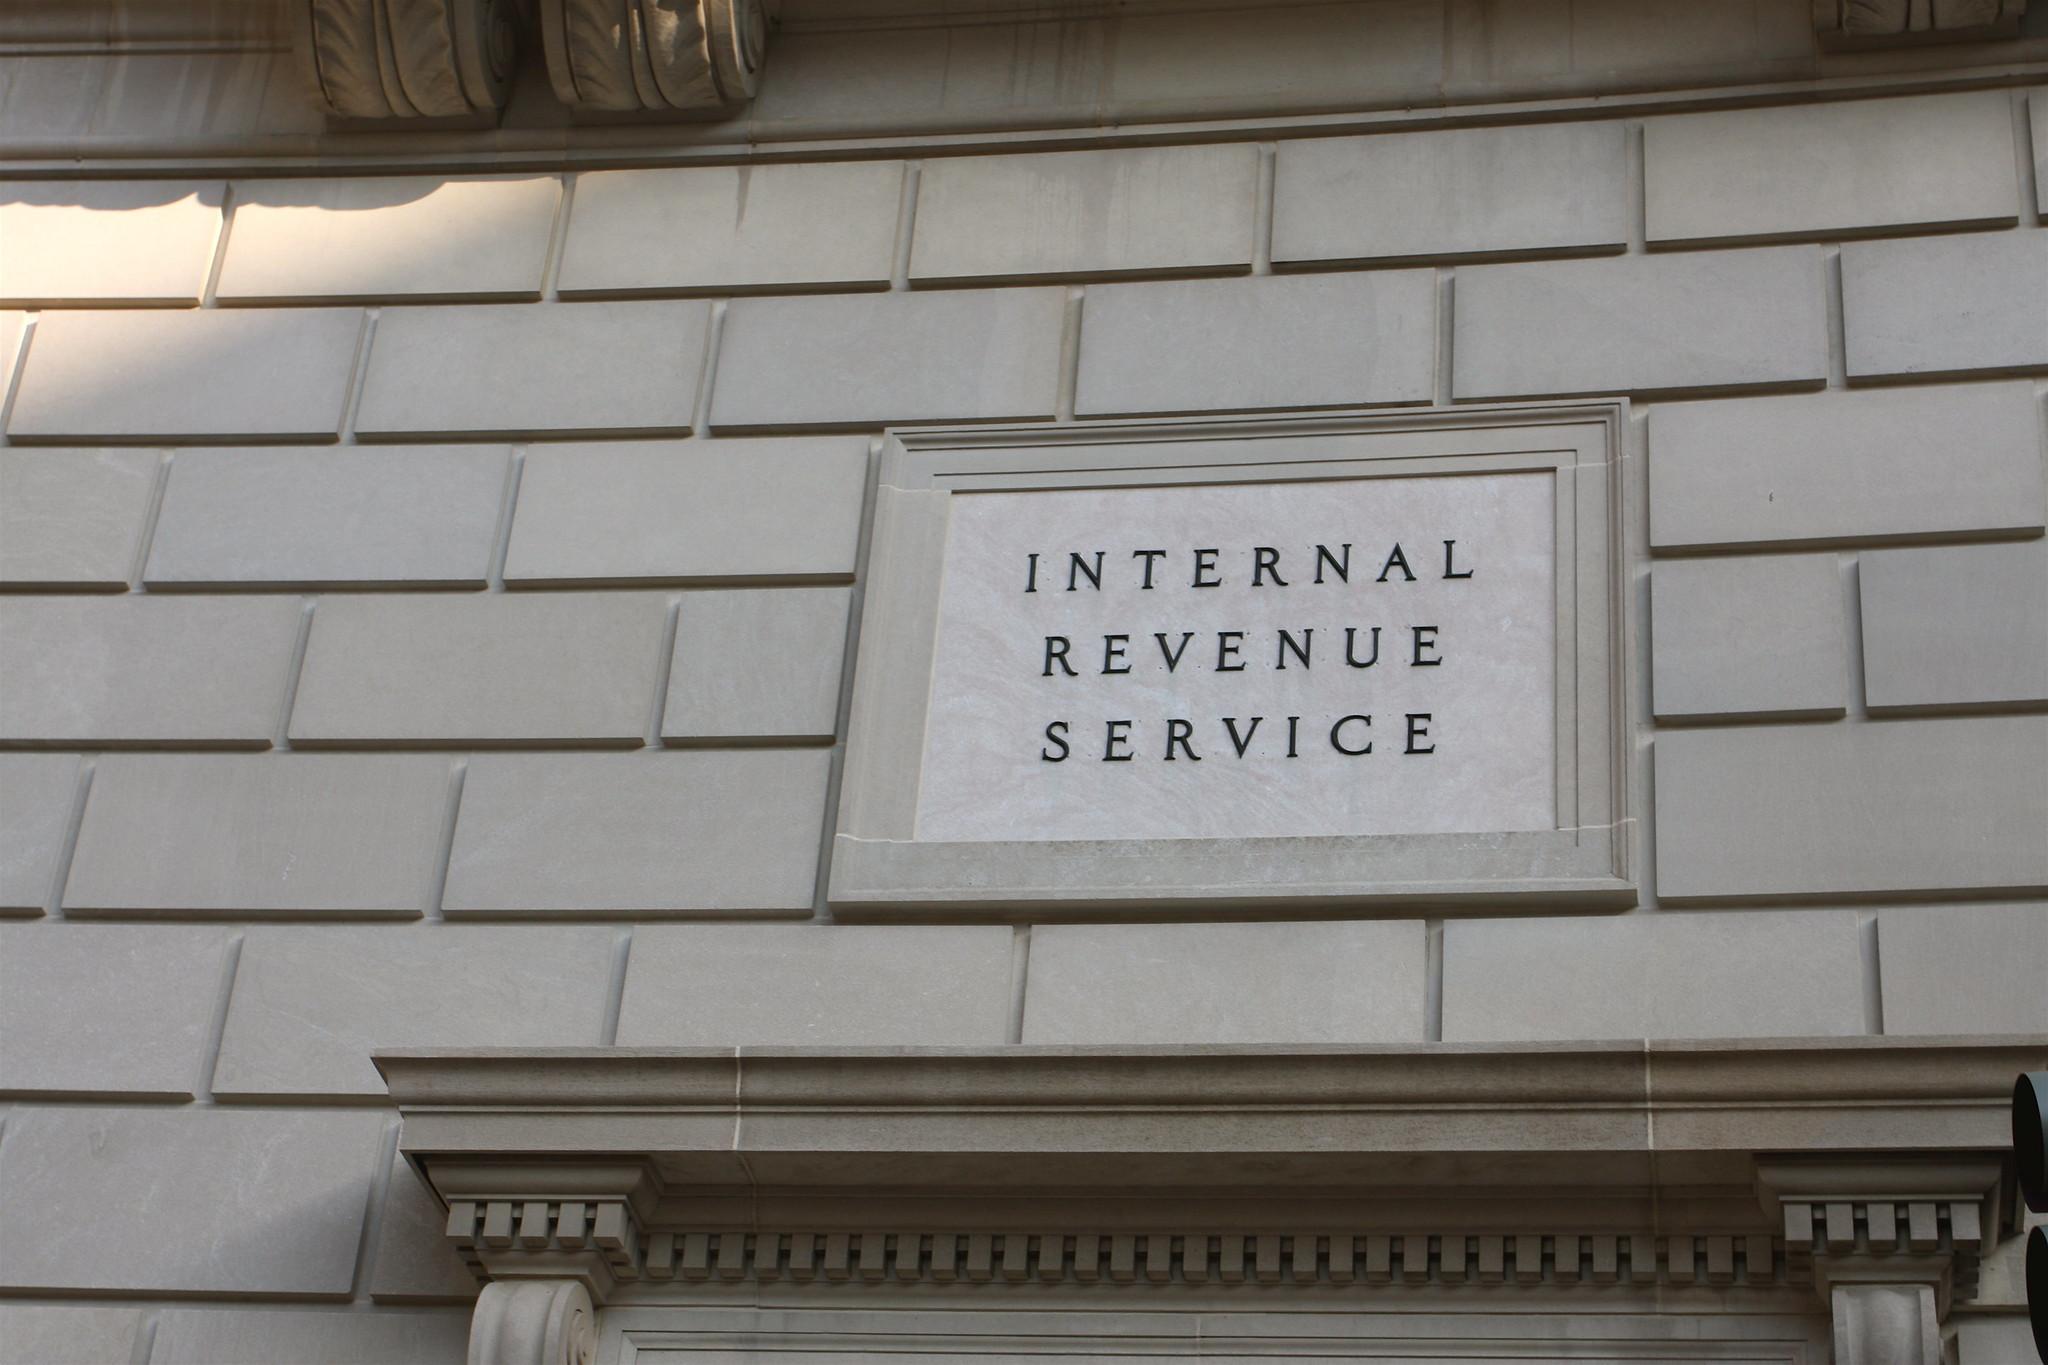 IRS_building_flickr